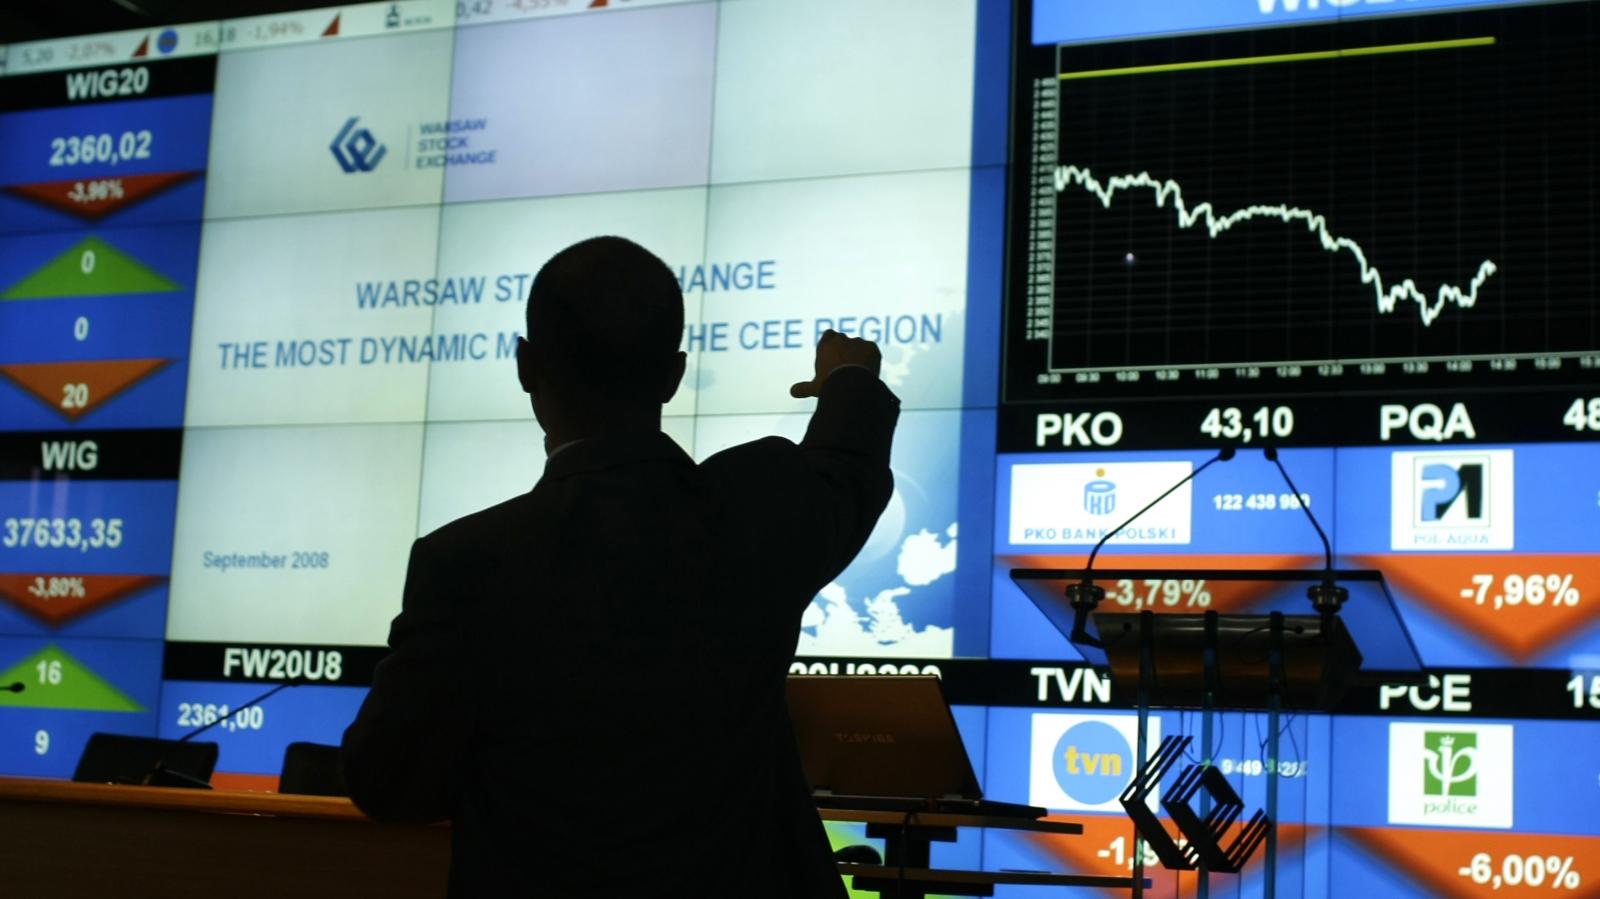 2008 financial crash